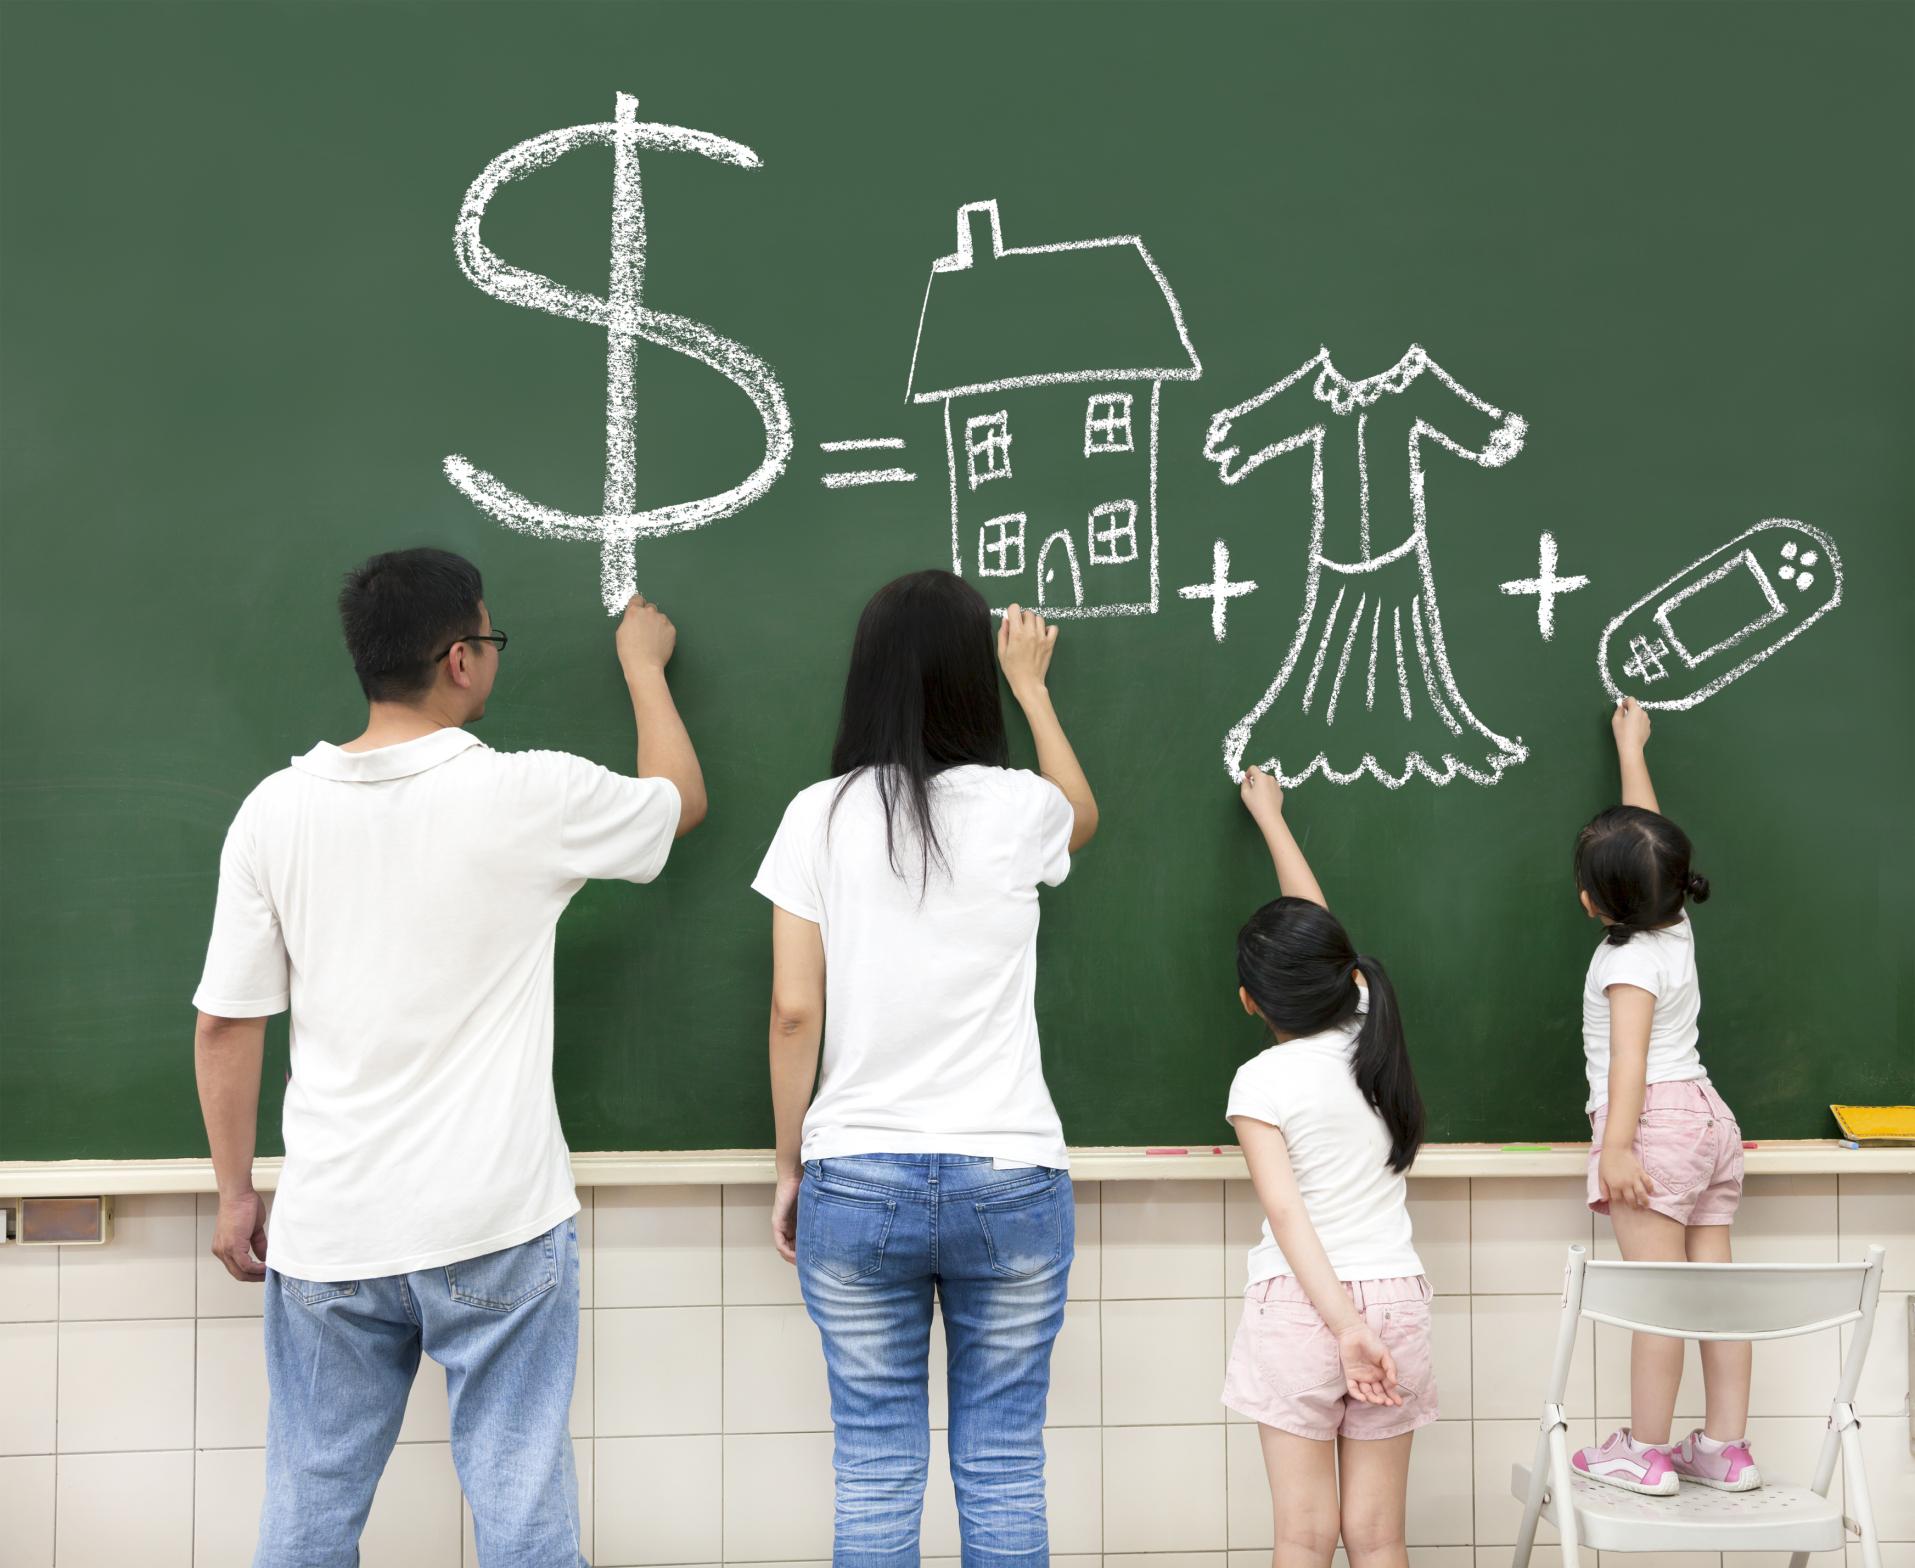 Семейные финансы